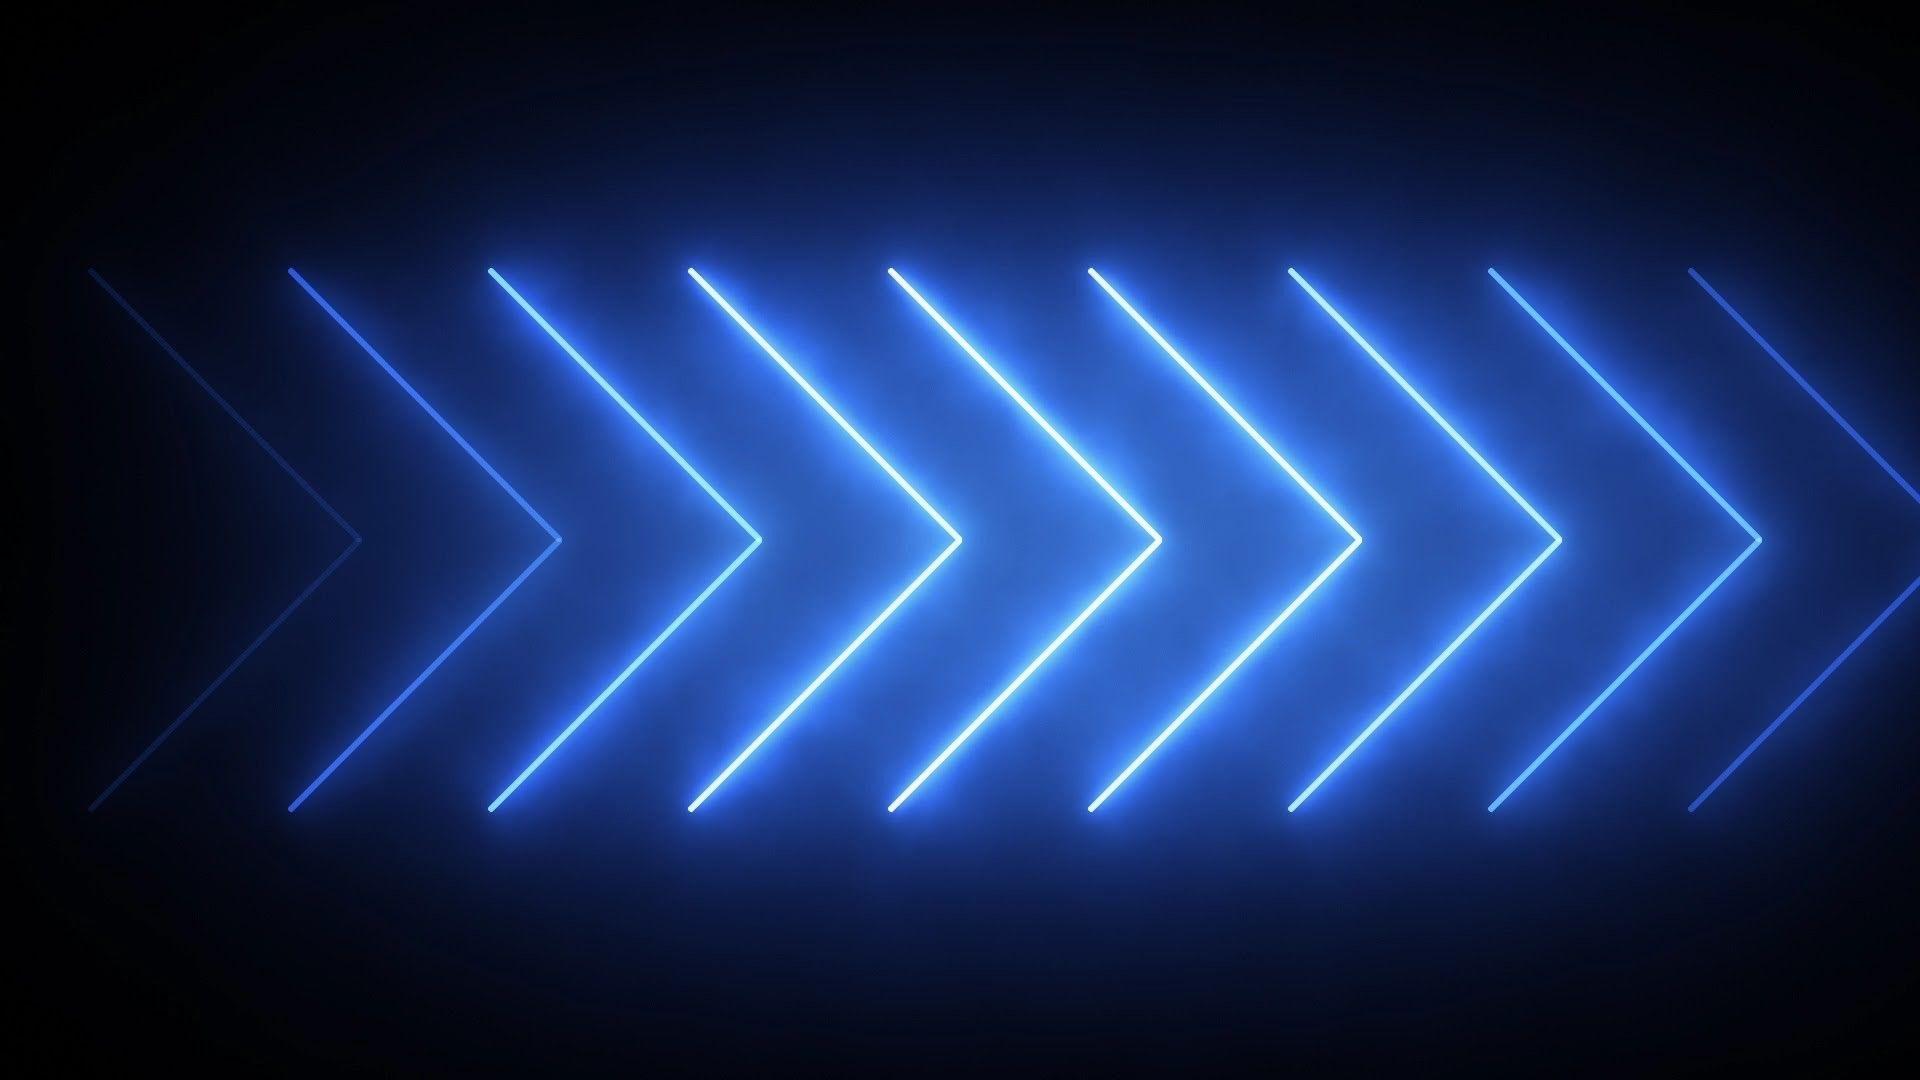 Blue Neon Wallpaper Hd 2021 Live Wallpaper Hd Neon Wallpaper Neon Backgrounds Aesthetic Wallpapers Electric blue neon neon wallpaper